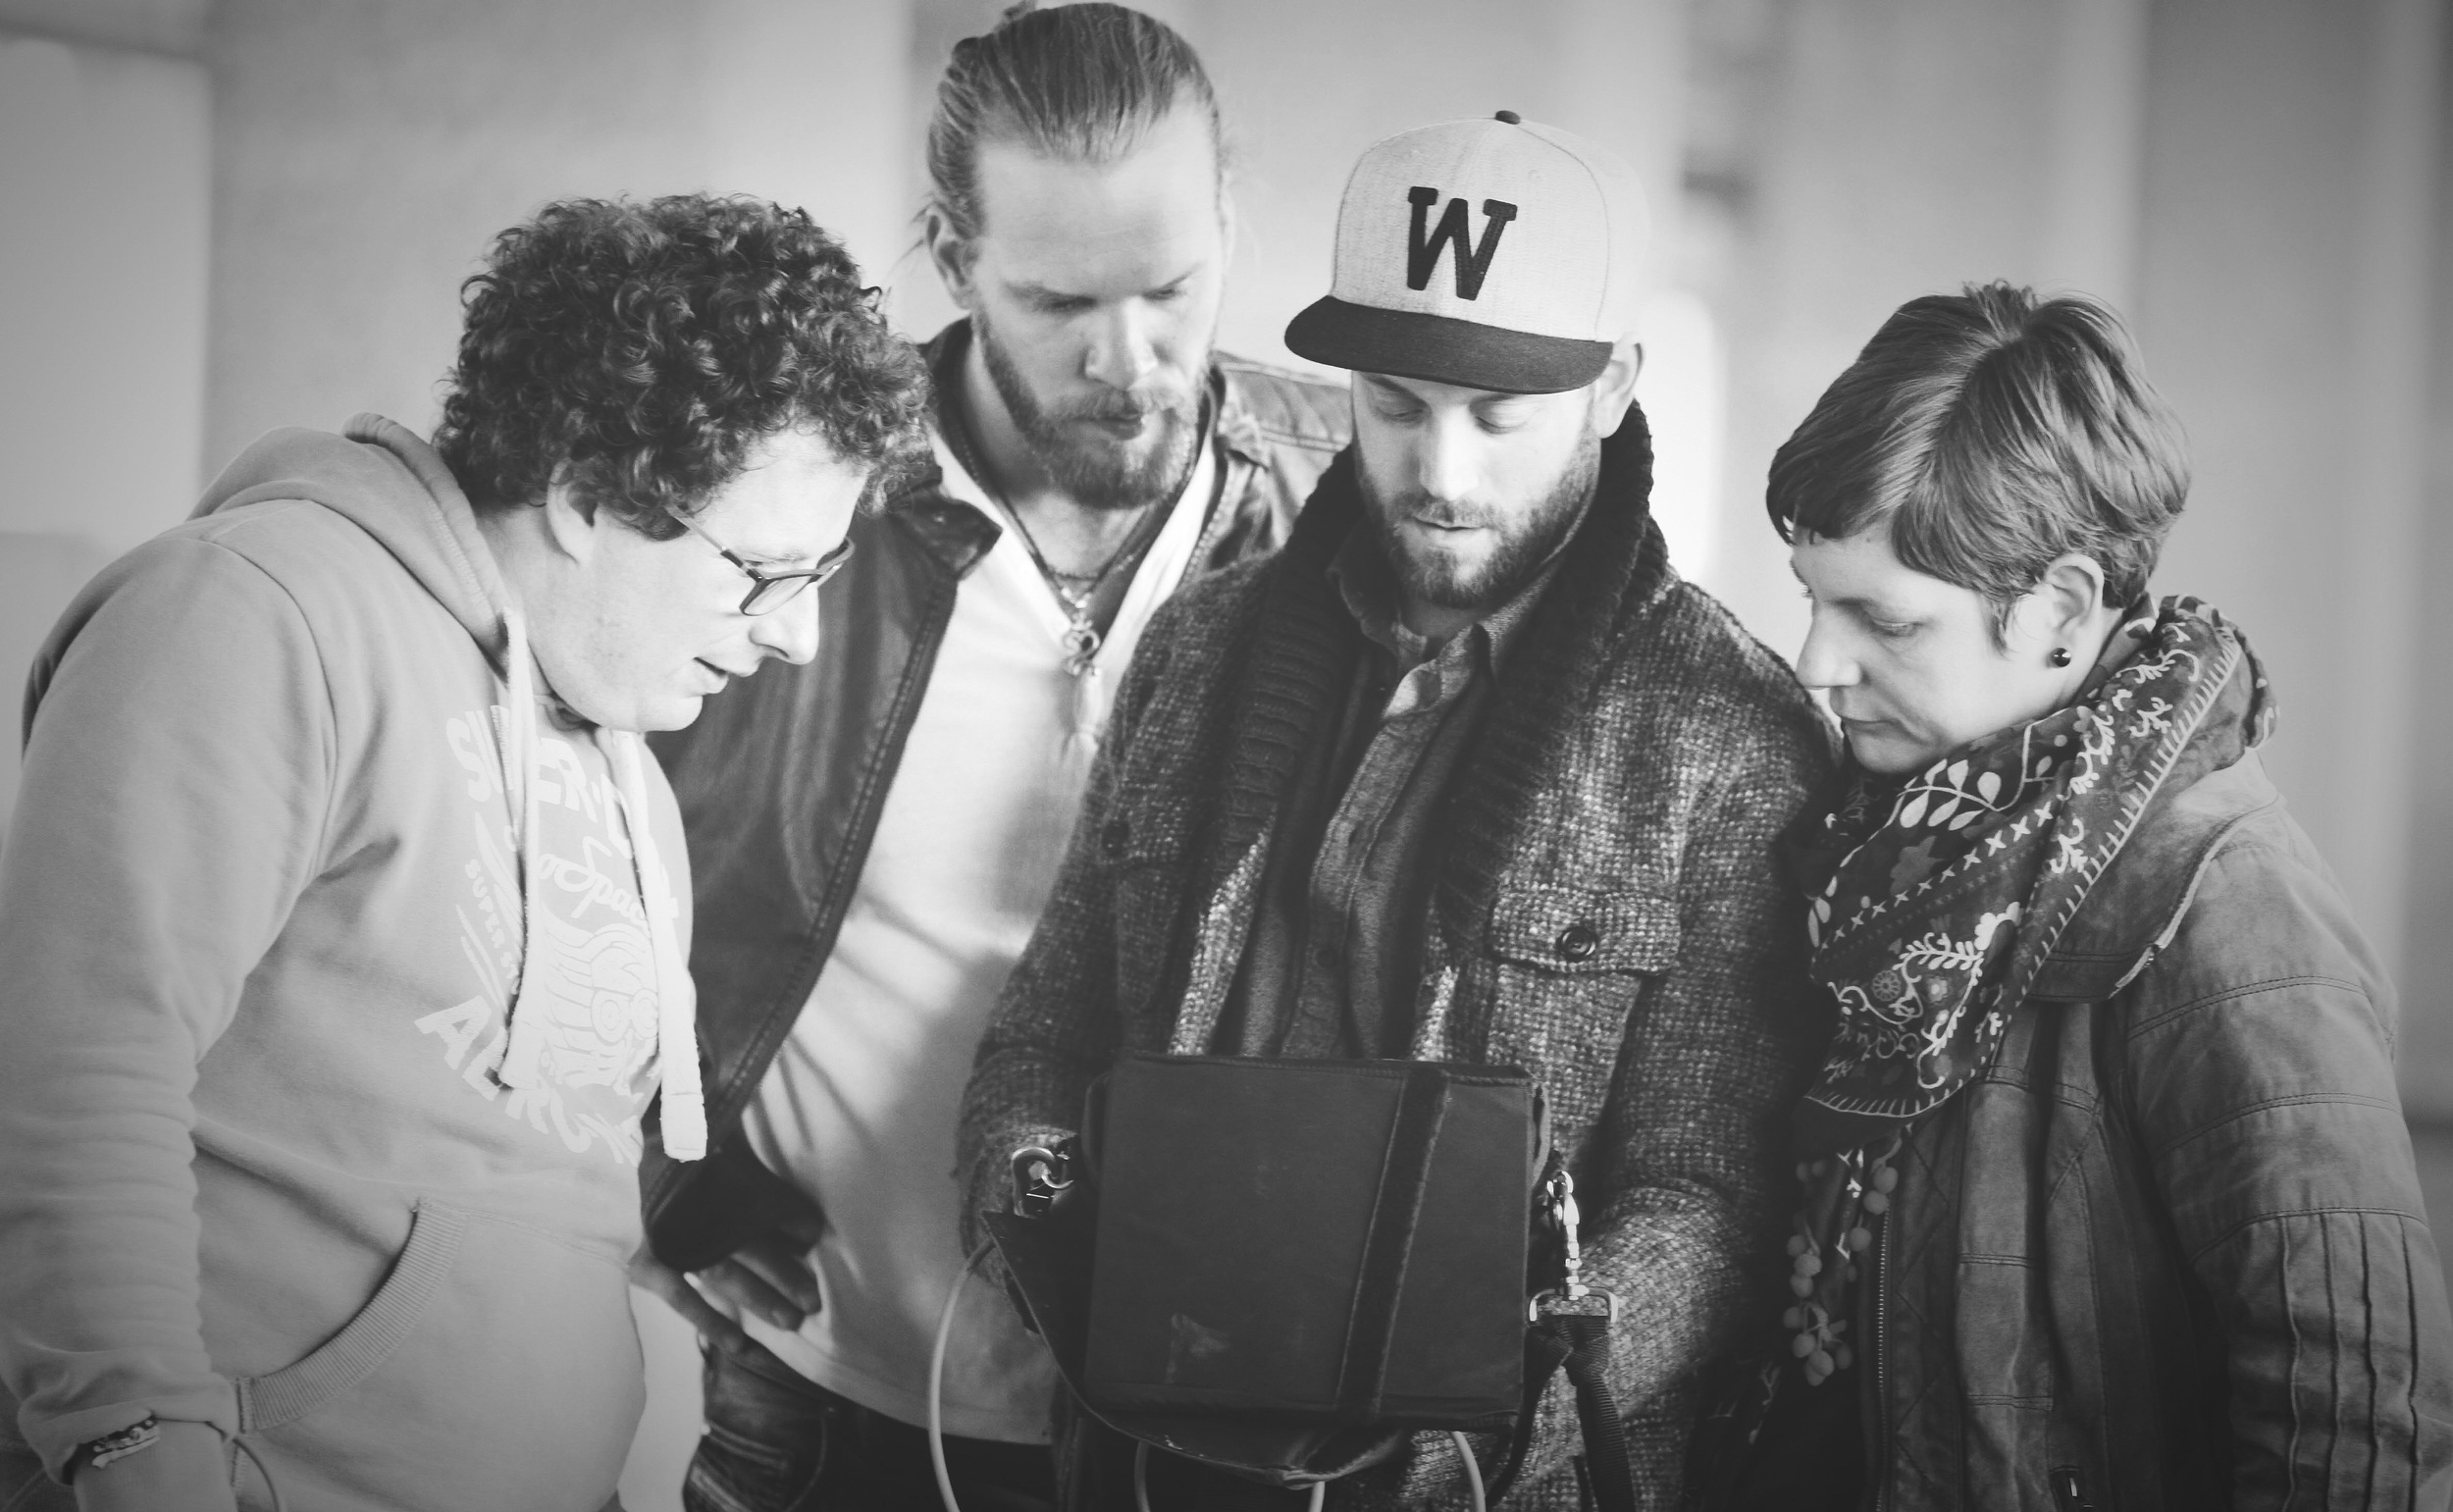 Tomreviewsthe last filmedtakeson the set of  Freiraum5  music video.